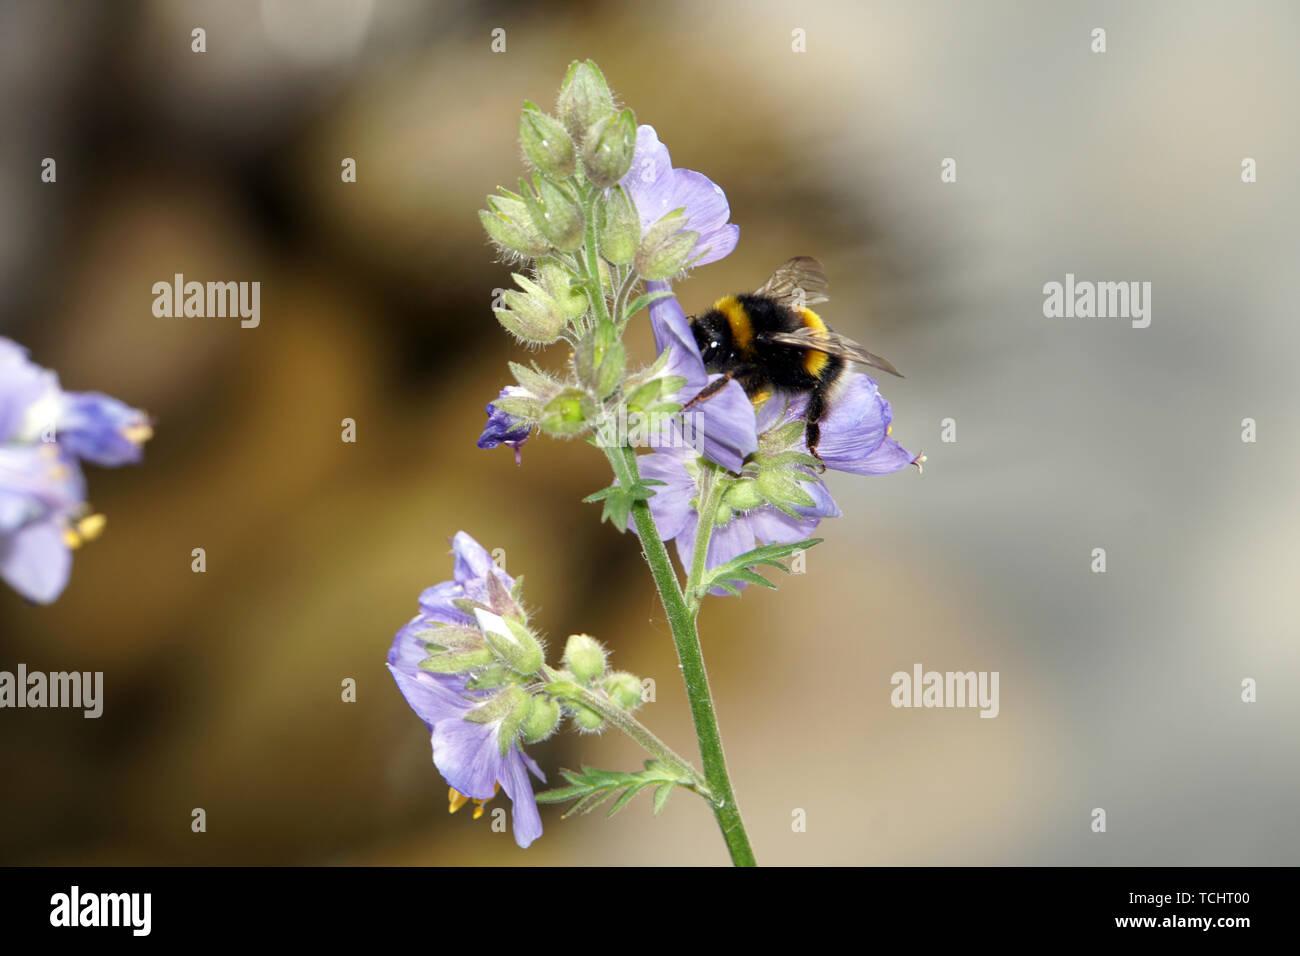 Hummel an einer Jakobsleiter, Himmelsleiter (Polemonium-Hybride) - Stock Image